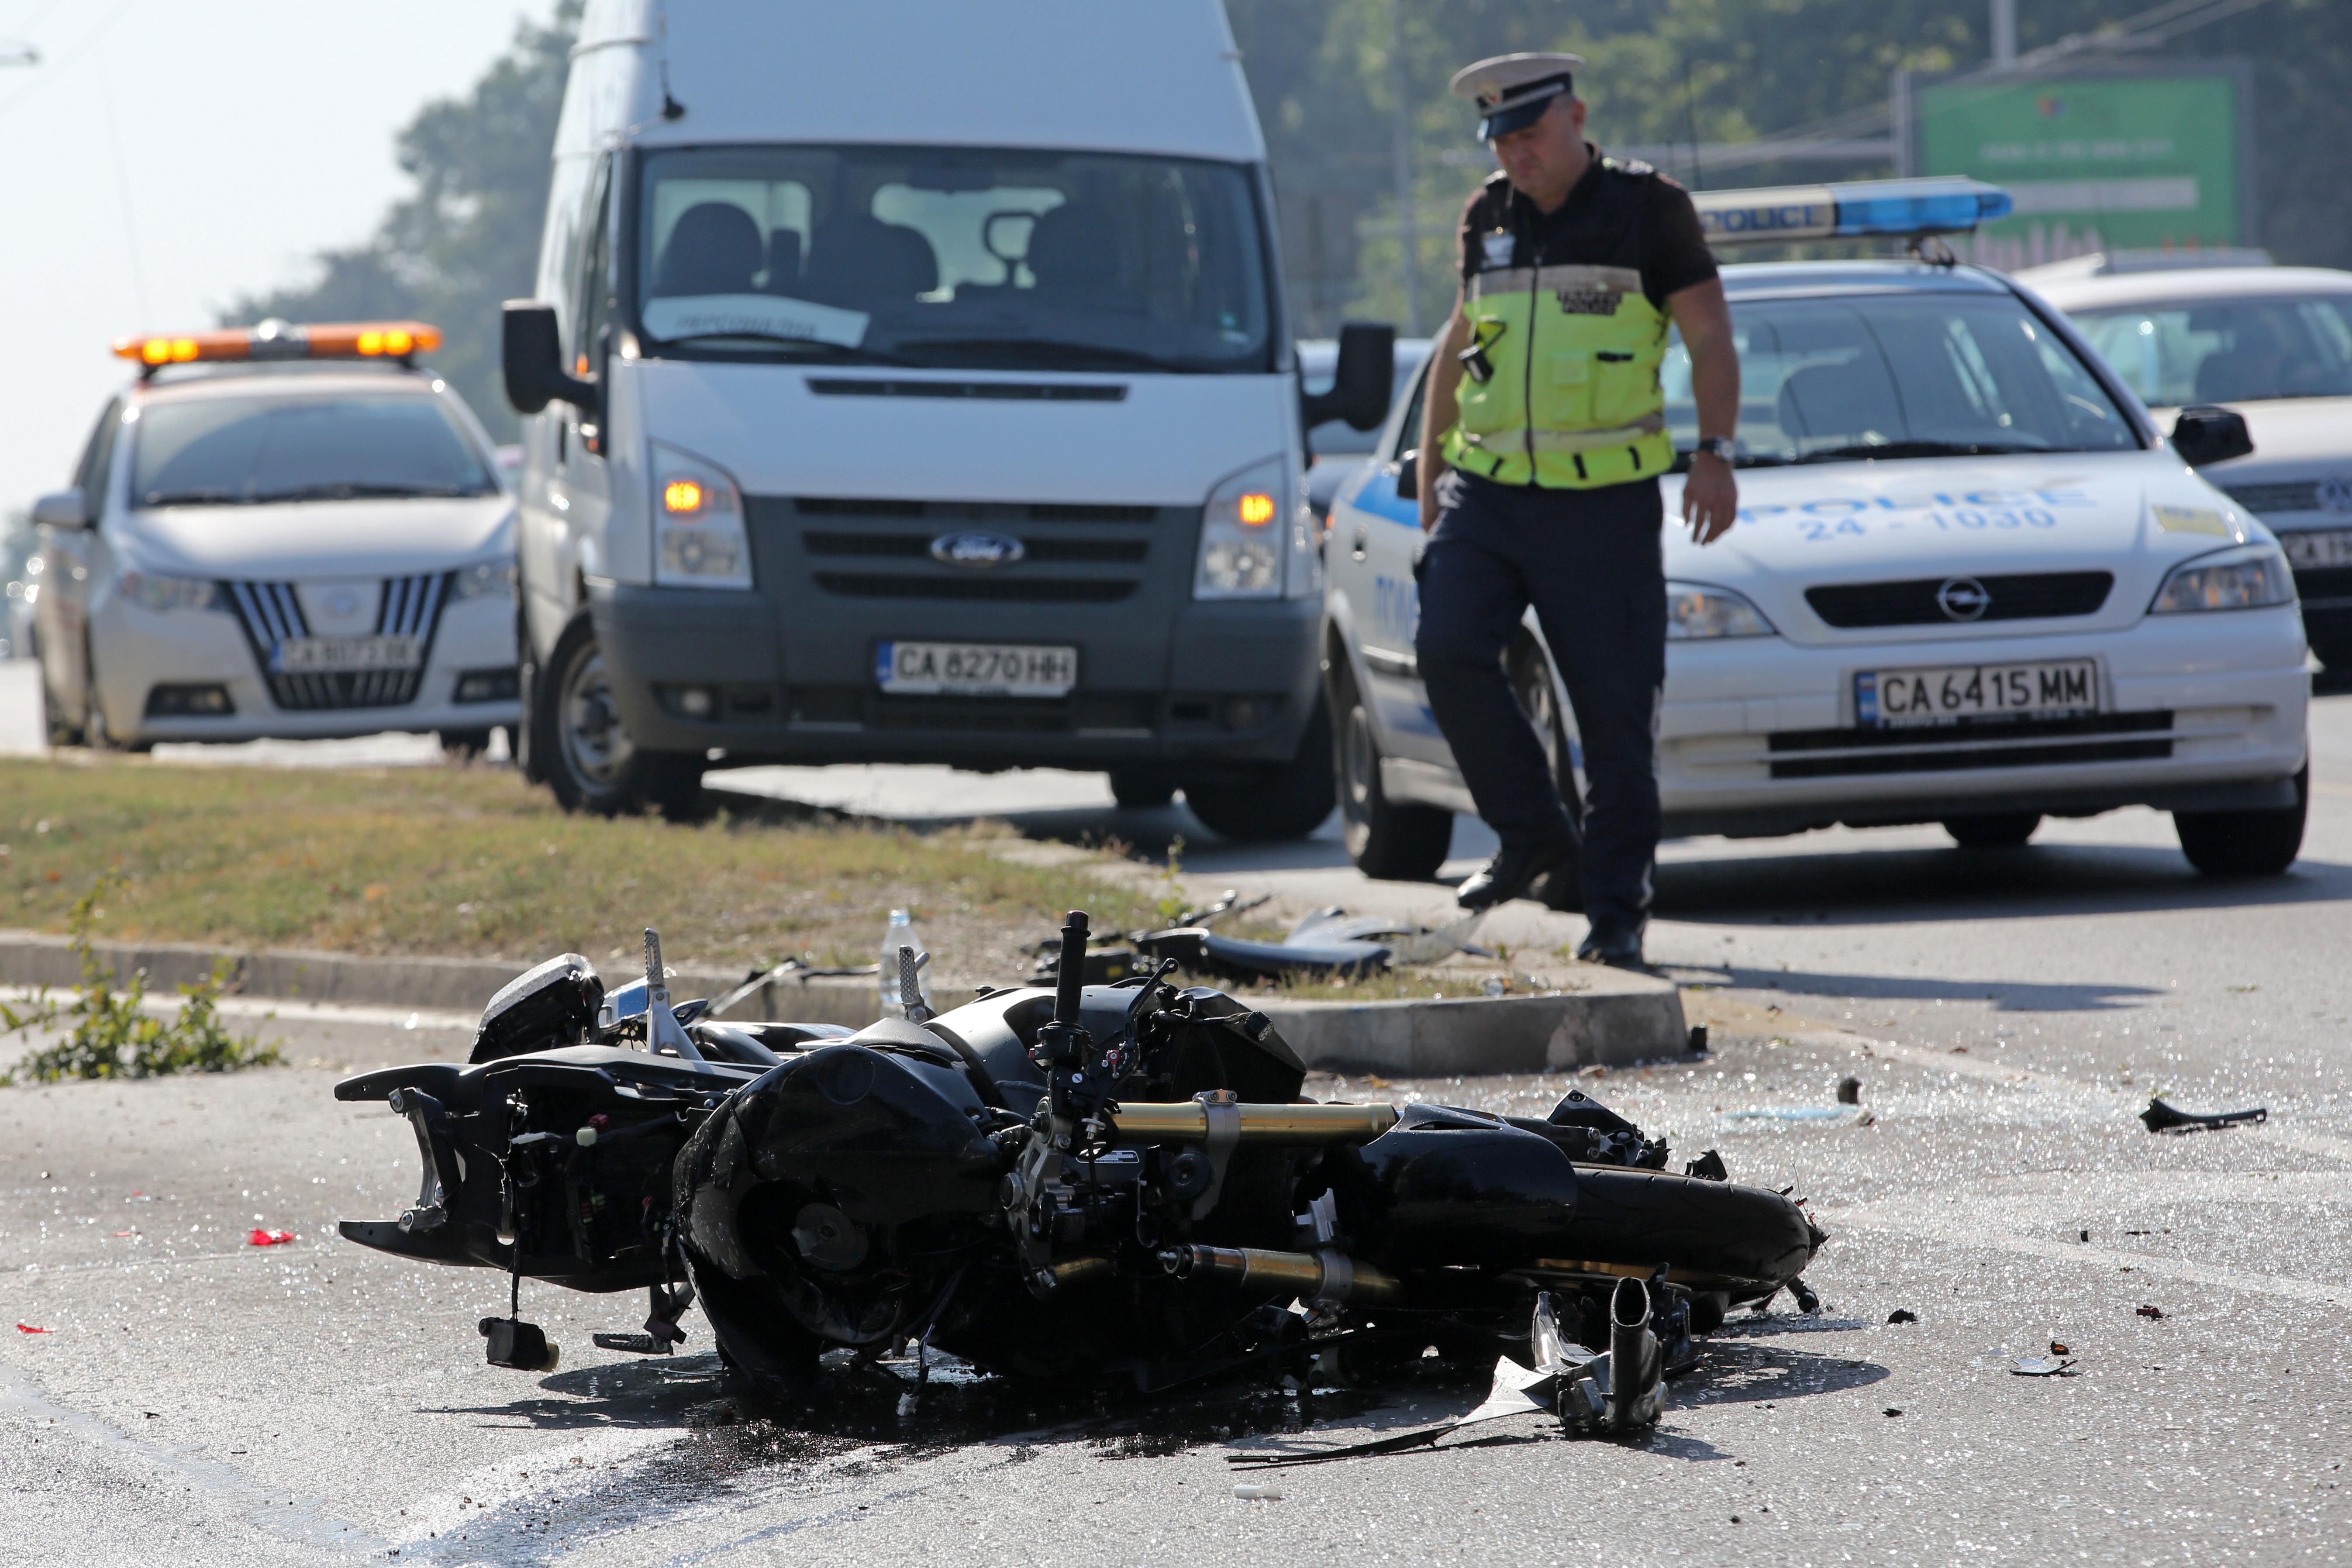 Моторист се бори за живот, блъснат след отнето предимство